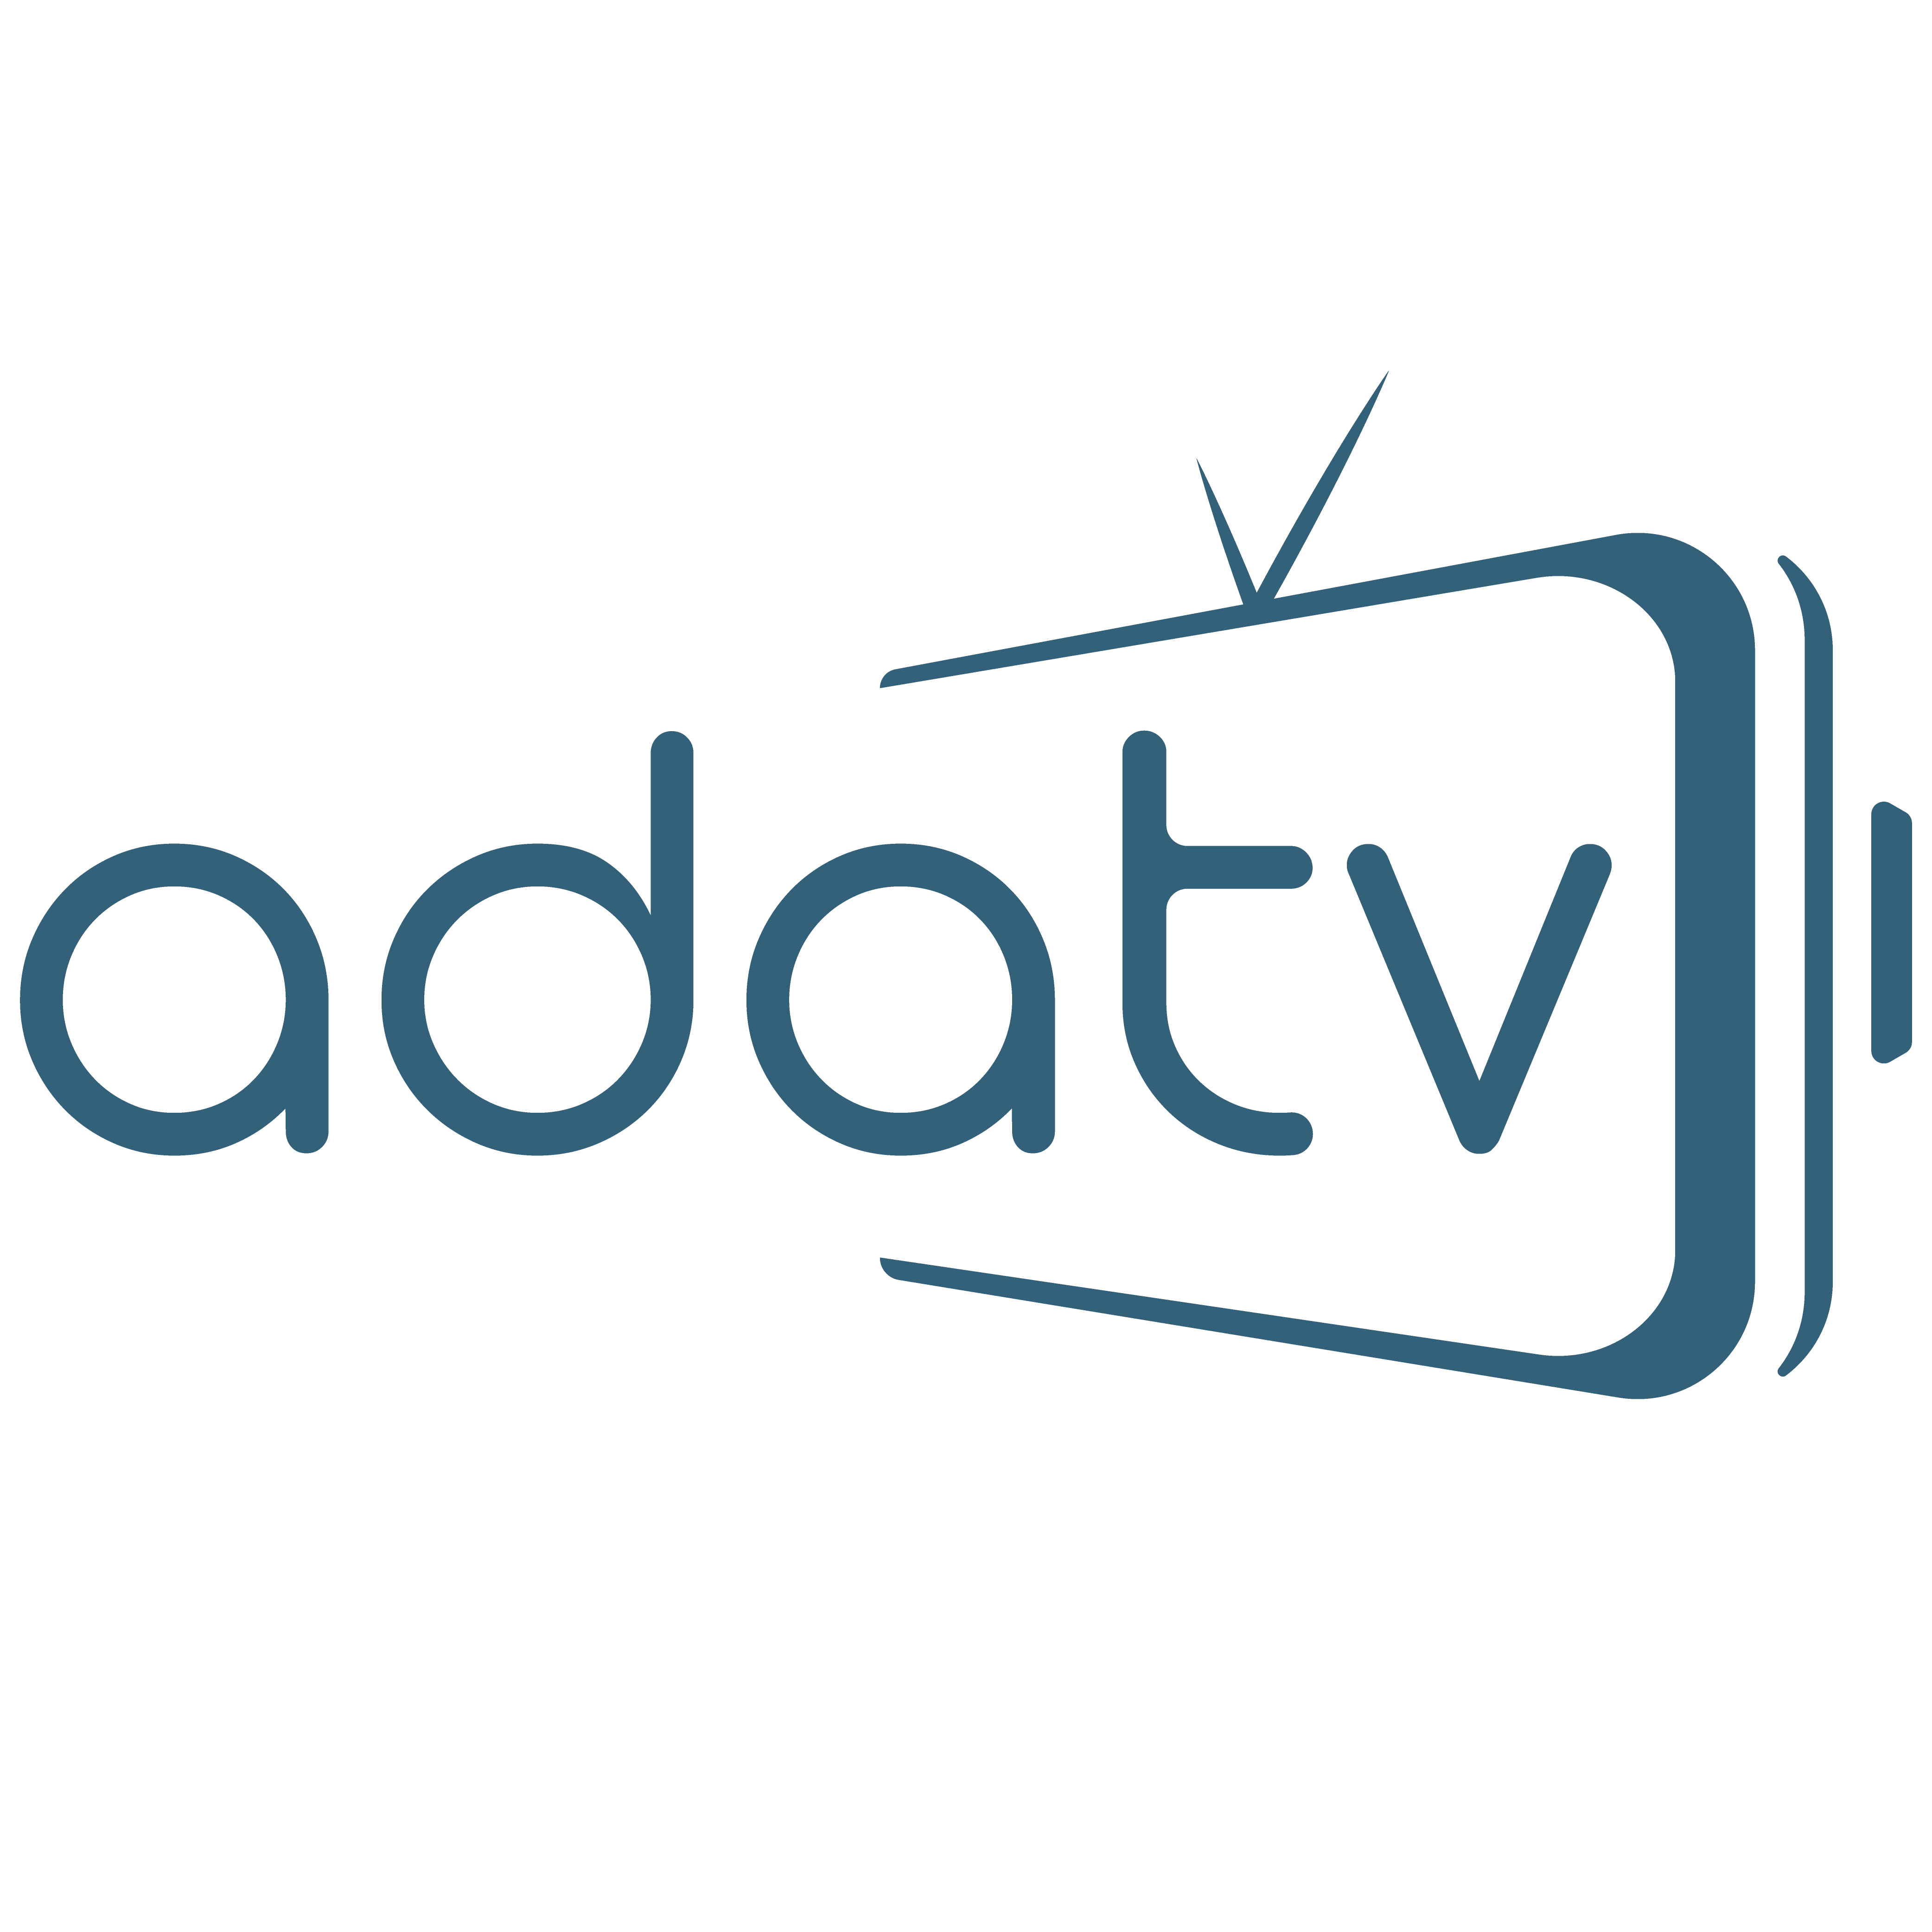 ADATV (Organization)